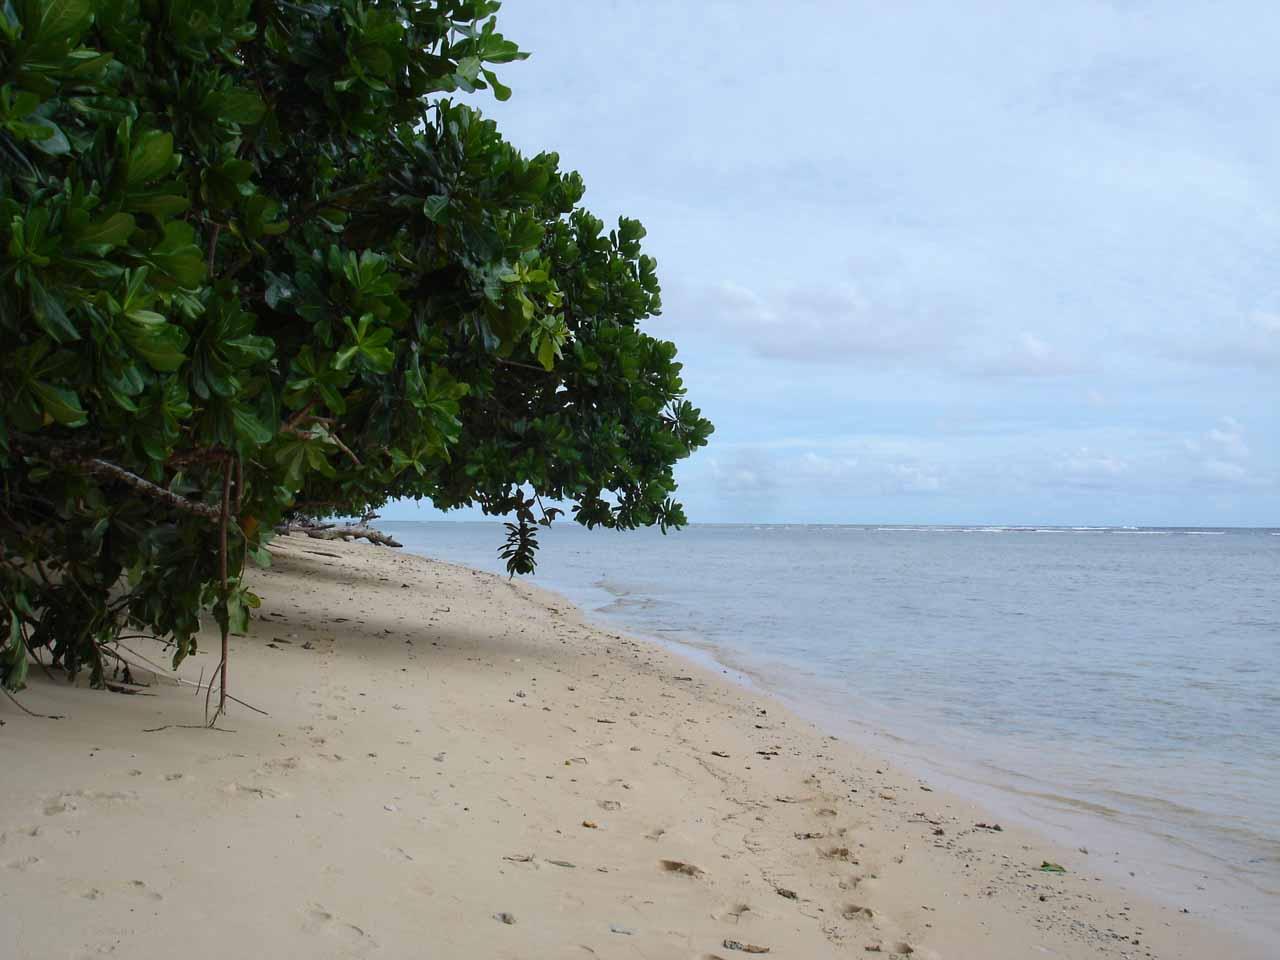 An inviting beach along the coastal walk